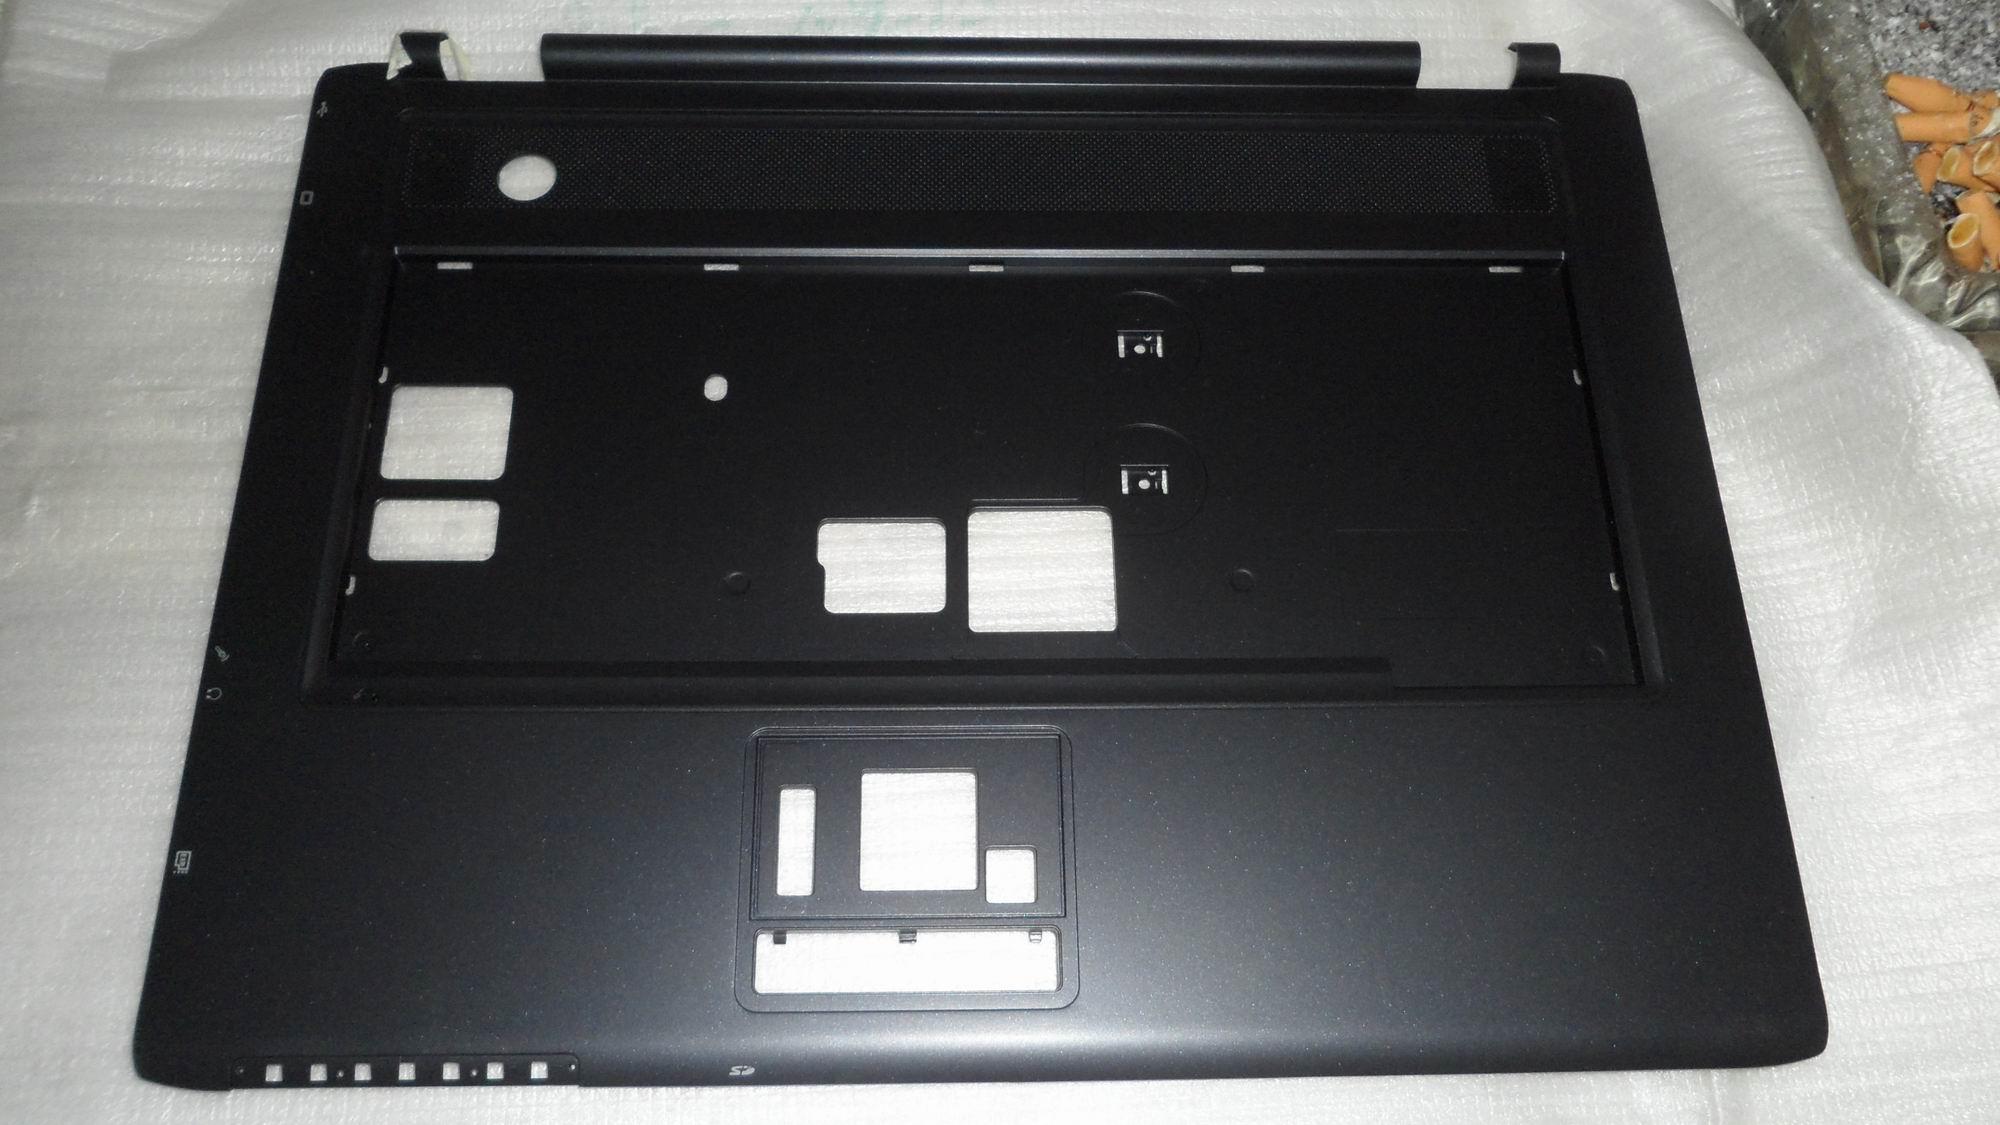 Notebook samsung cena - For Samsung R510 R503 R507 R508 R509 P510 C Shell Top Shell China Mainland